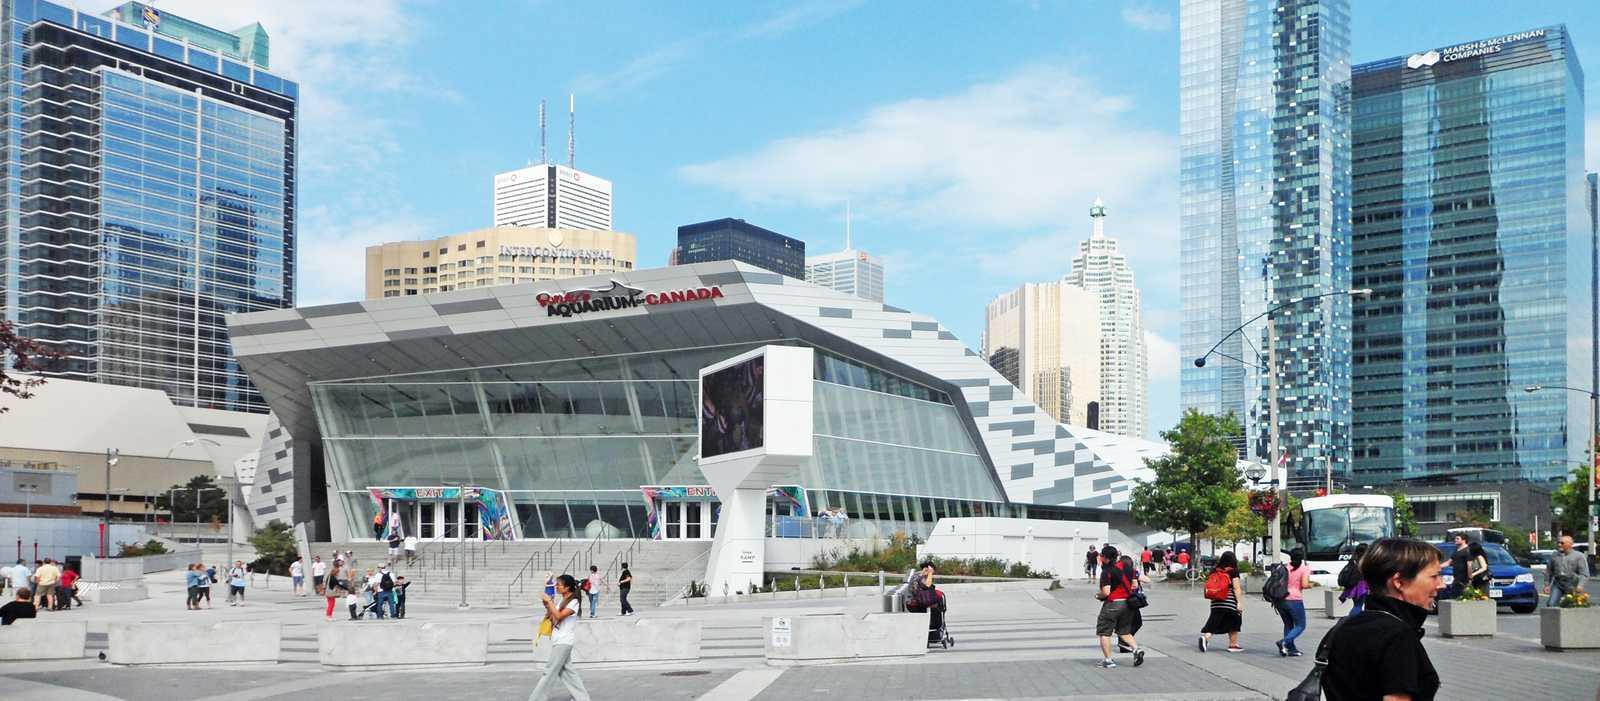 Ripleys Aquarium in Toronto